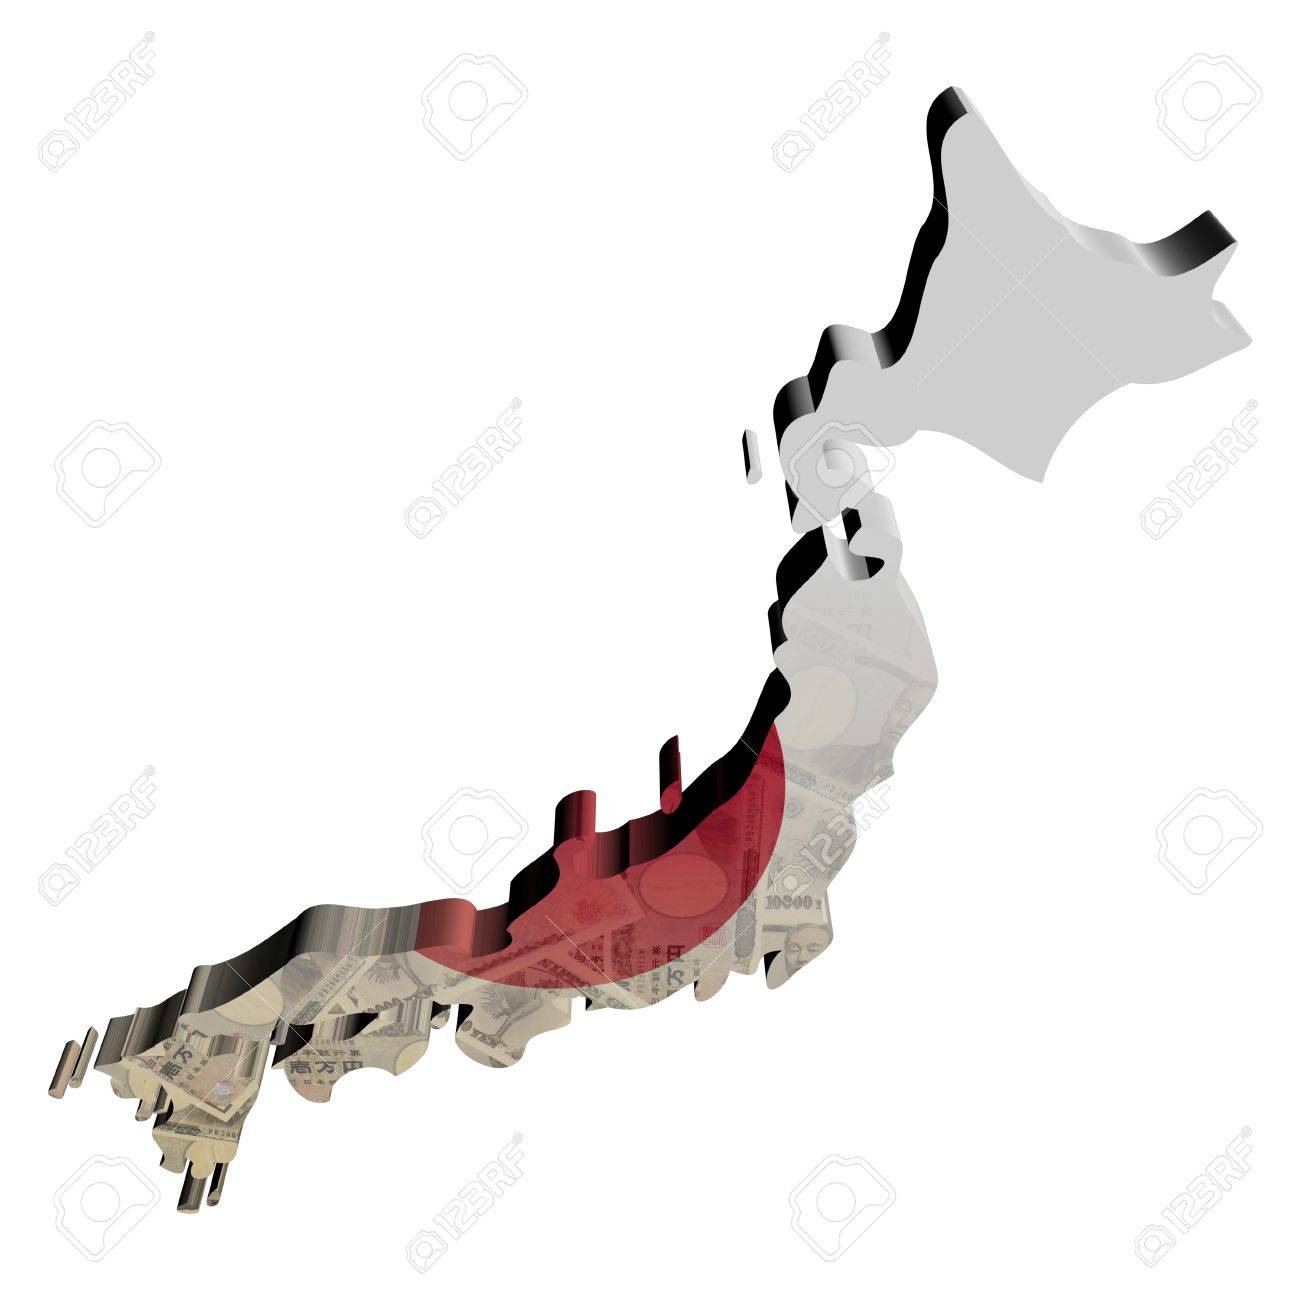 Japan Map Flag With Yen D Render Illustration Stock Photo - Japan map flag